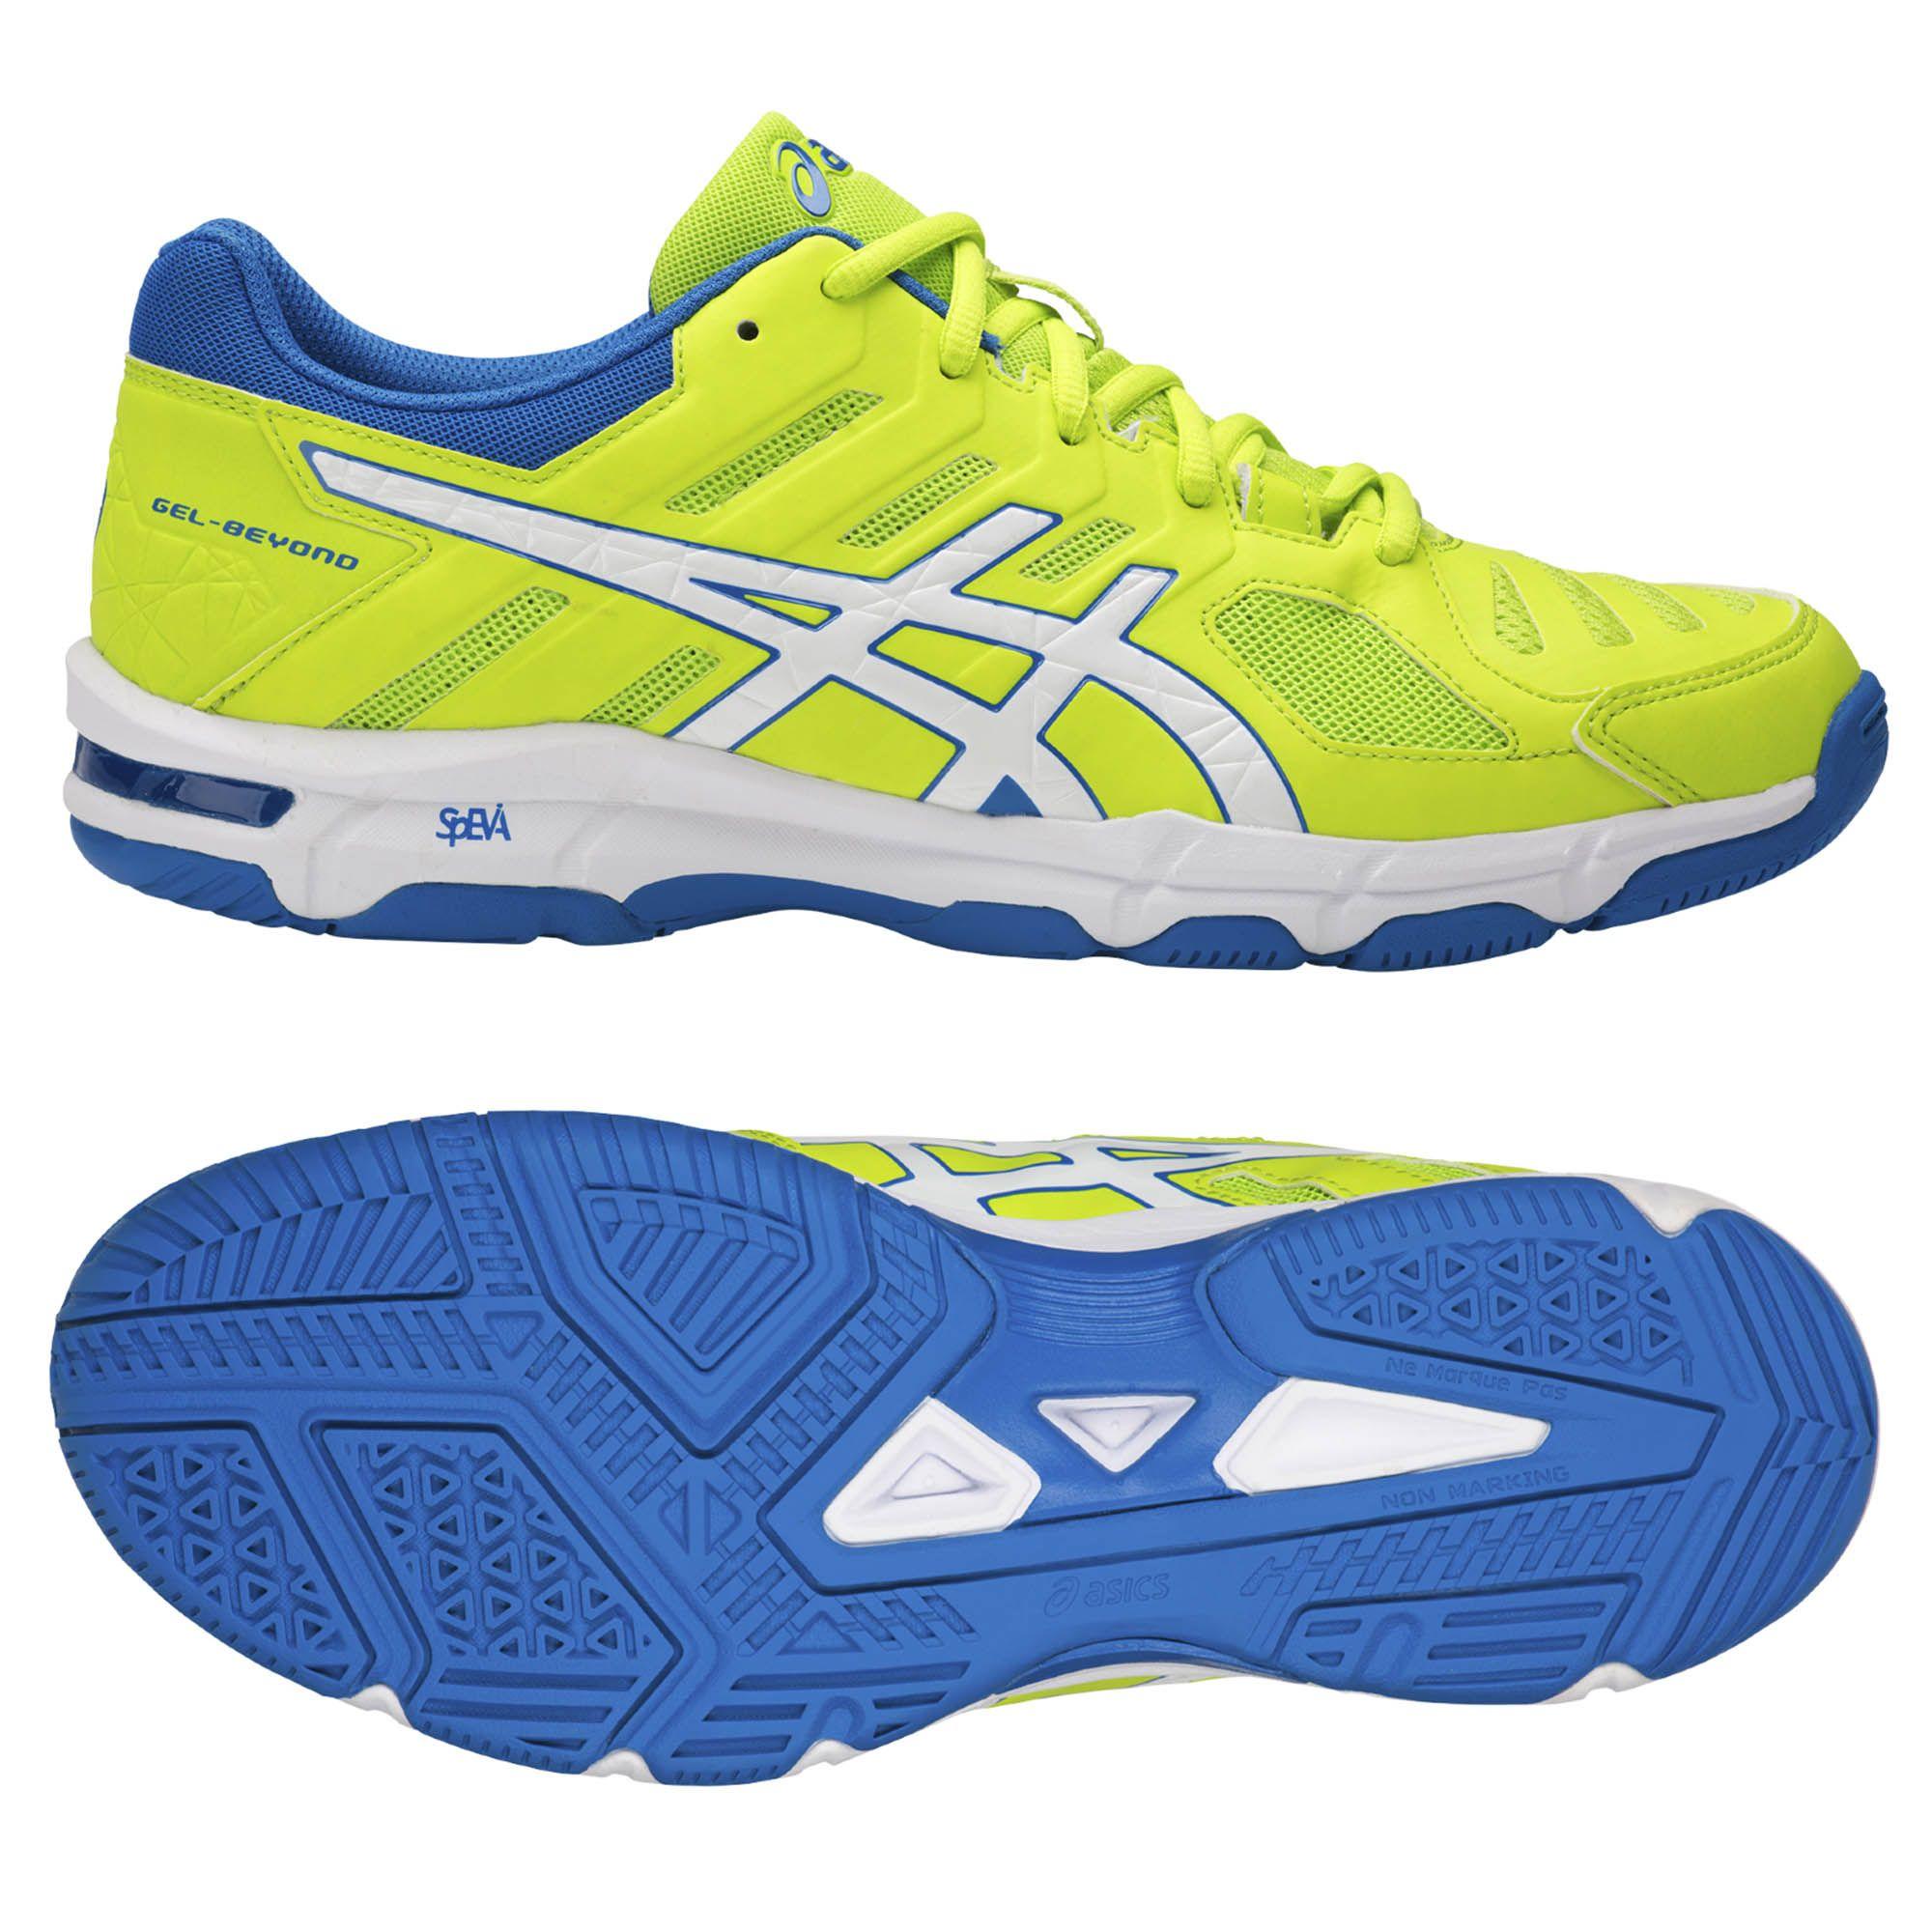 Asics Gel-Beyond 5 Mens Indoor Court Shoes